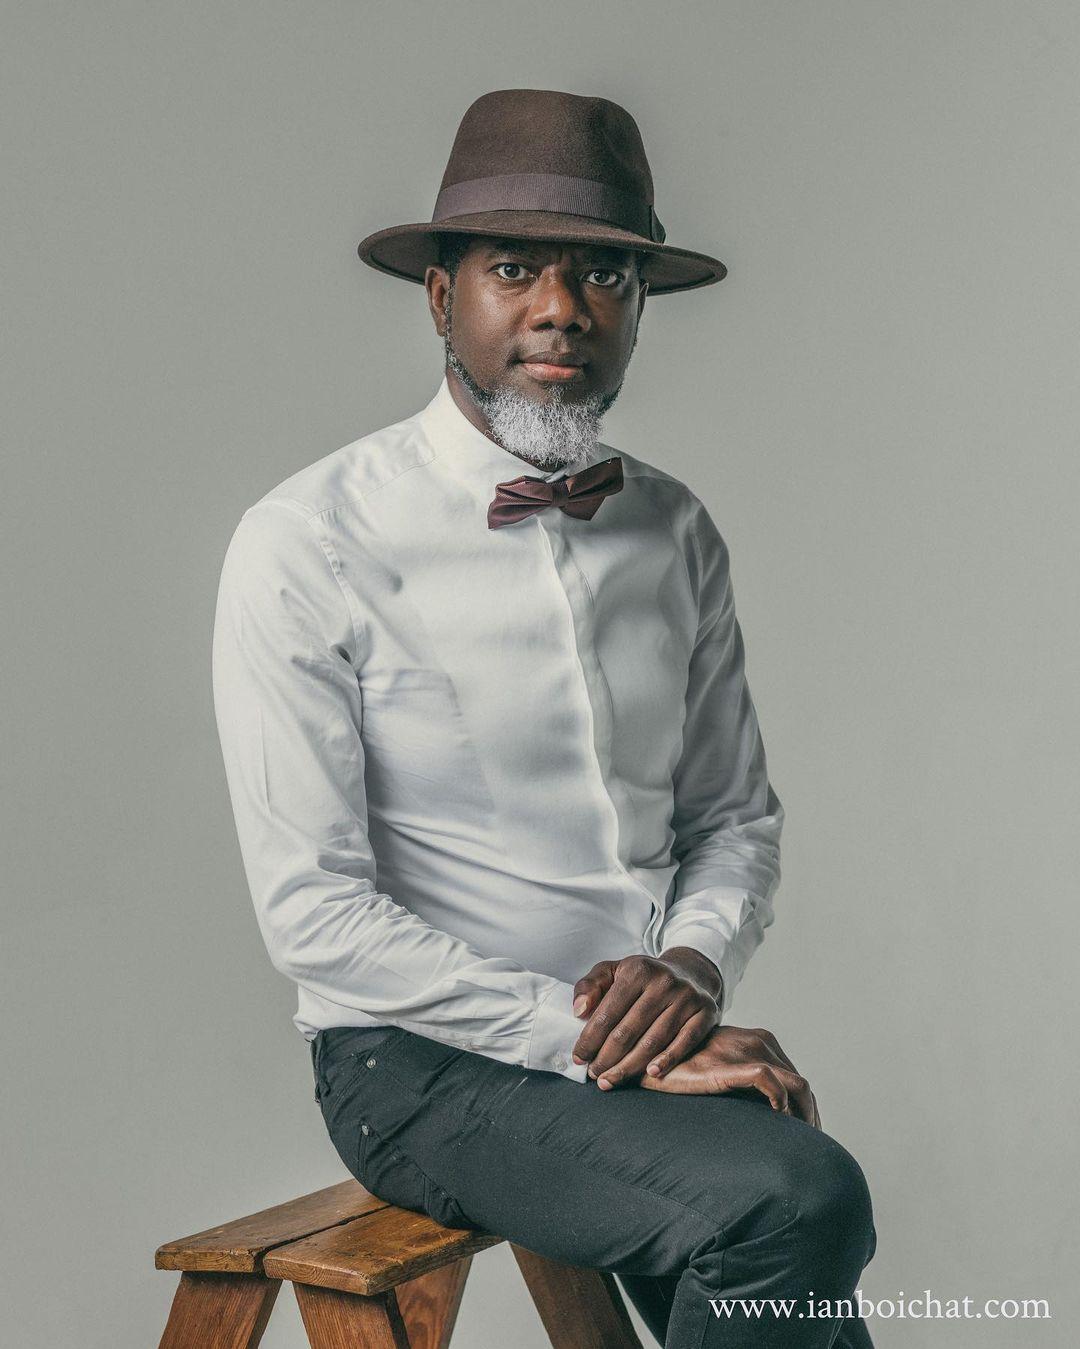 Reno Omokri Joe Igbokwe